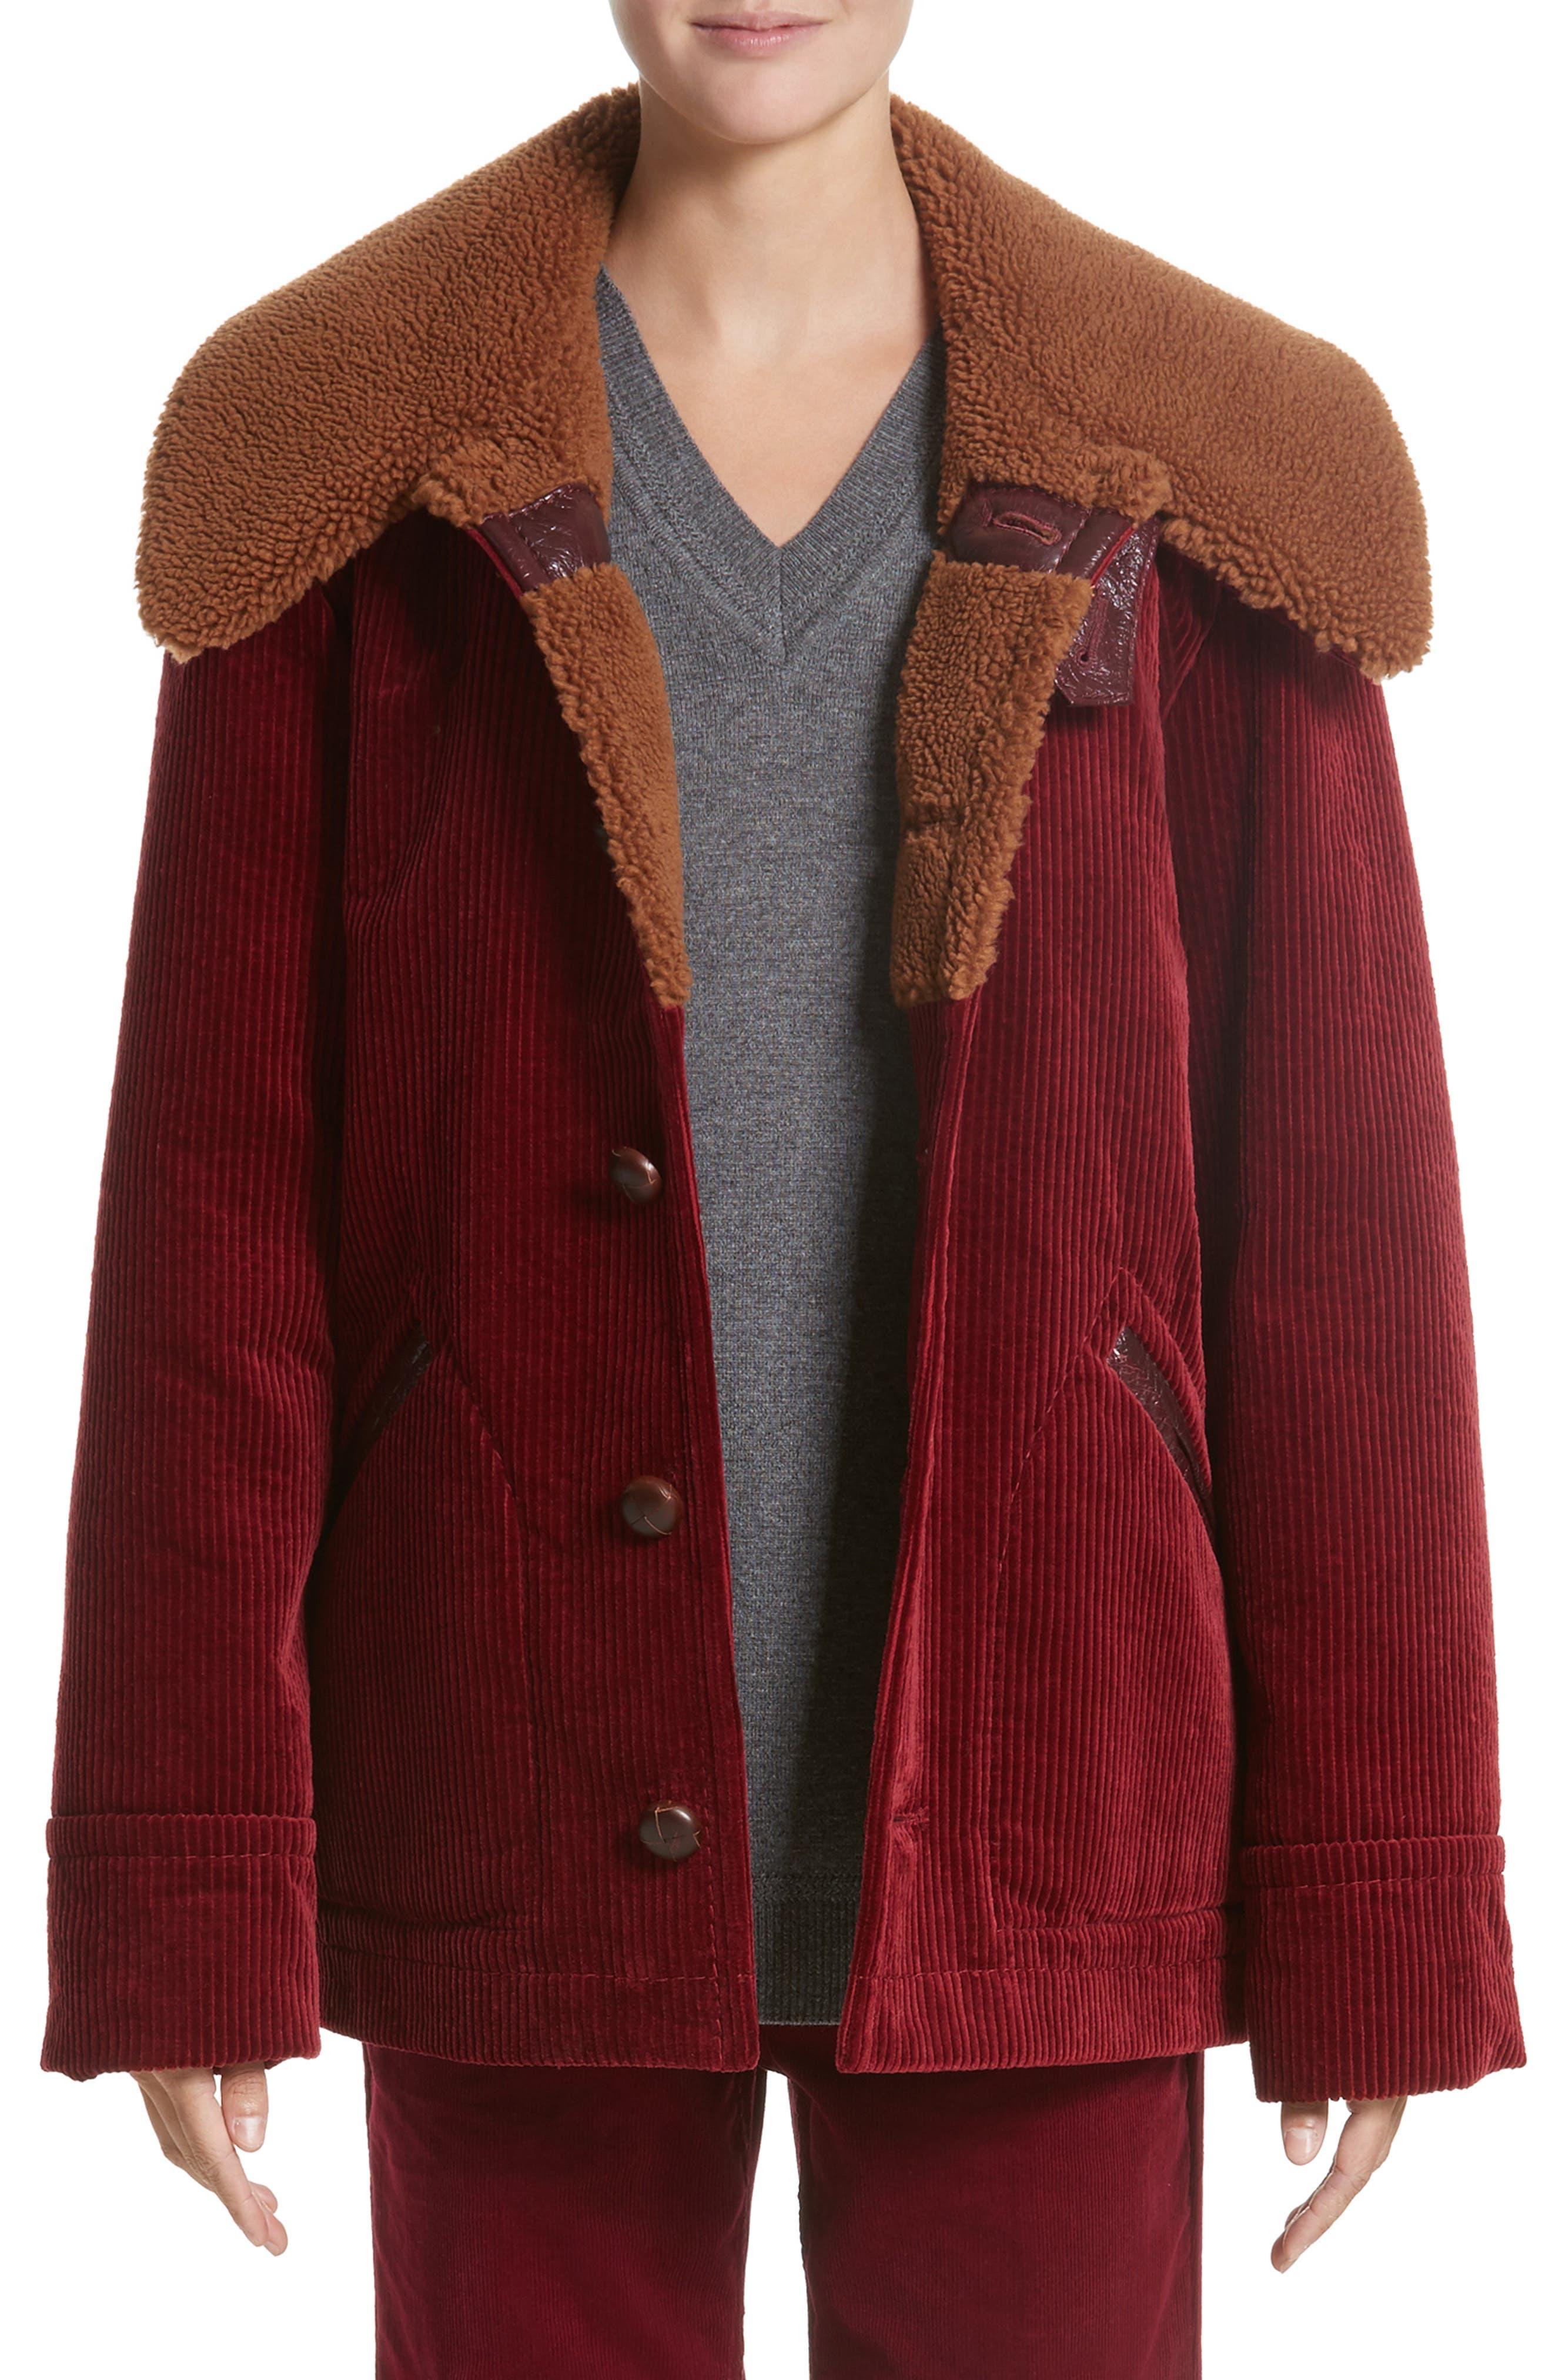 Corduroy Coat with Faux Shearling Collar,                             Main thumbnail 1, color,                             Bordeaux